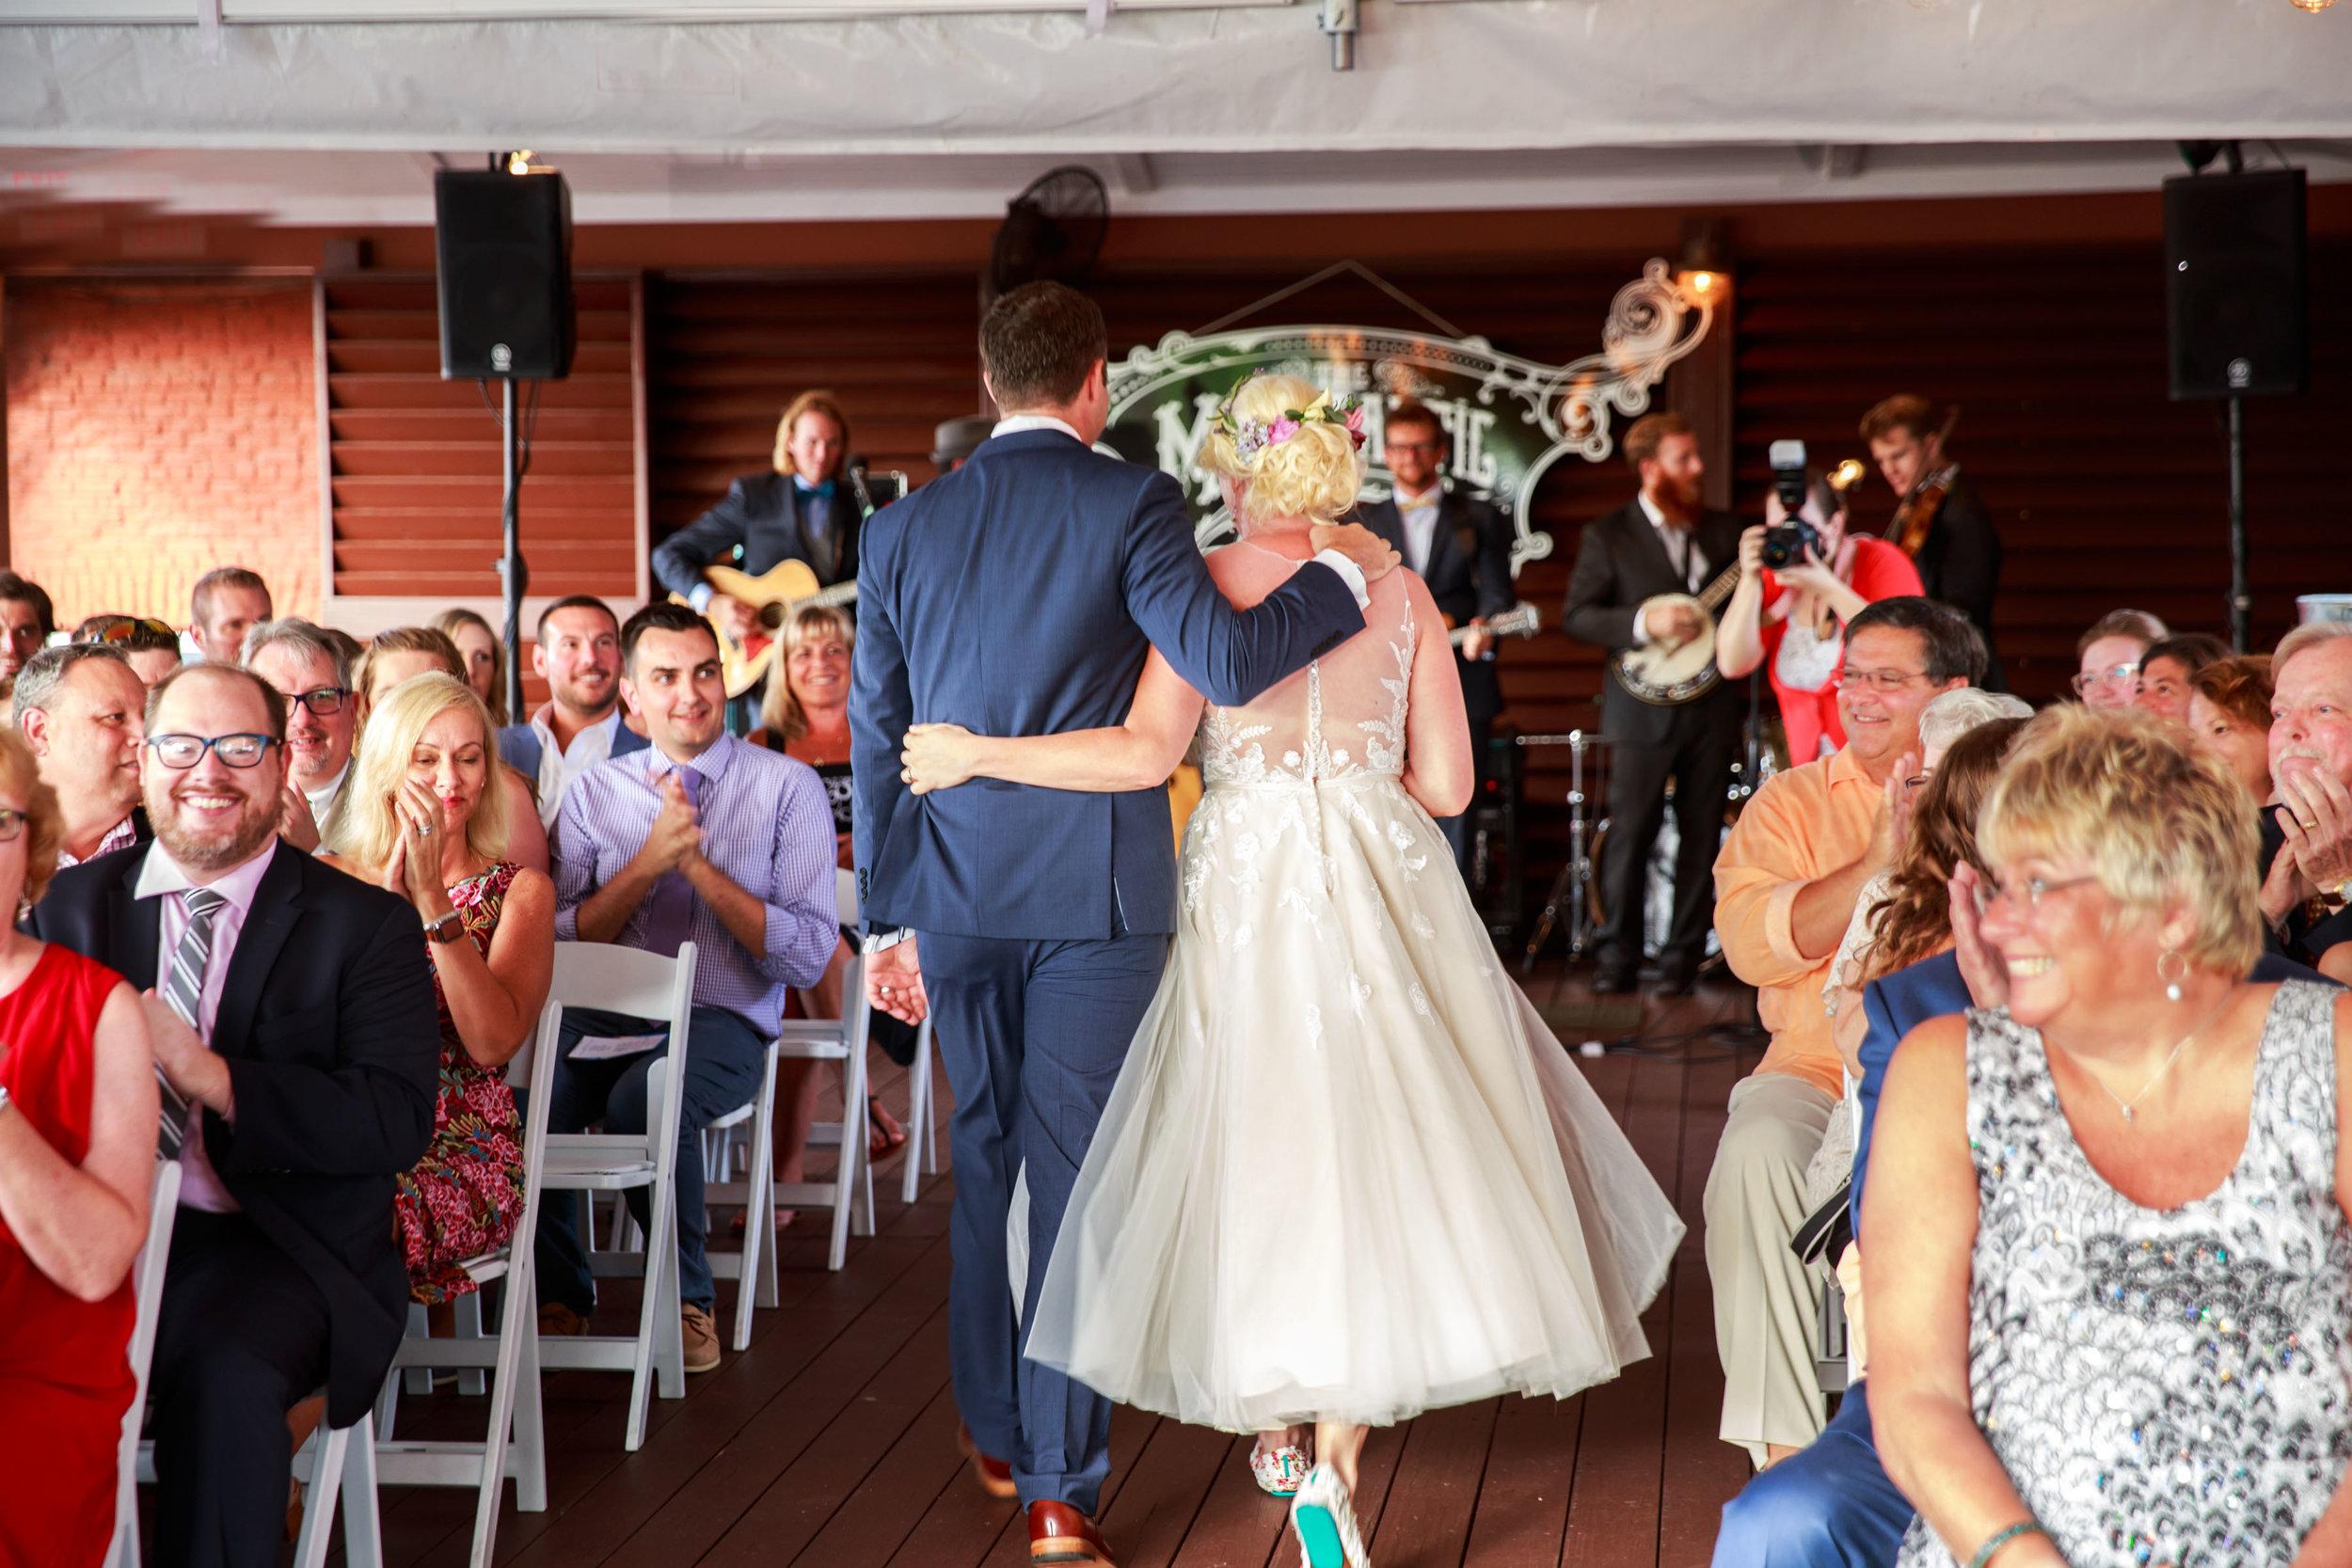 128-South-Wedding-Wilmington-NC-Photographer-Ceremony-26.jpg